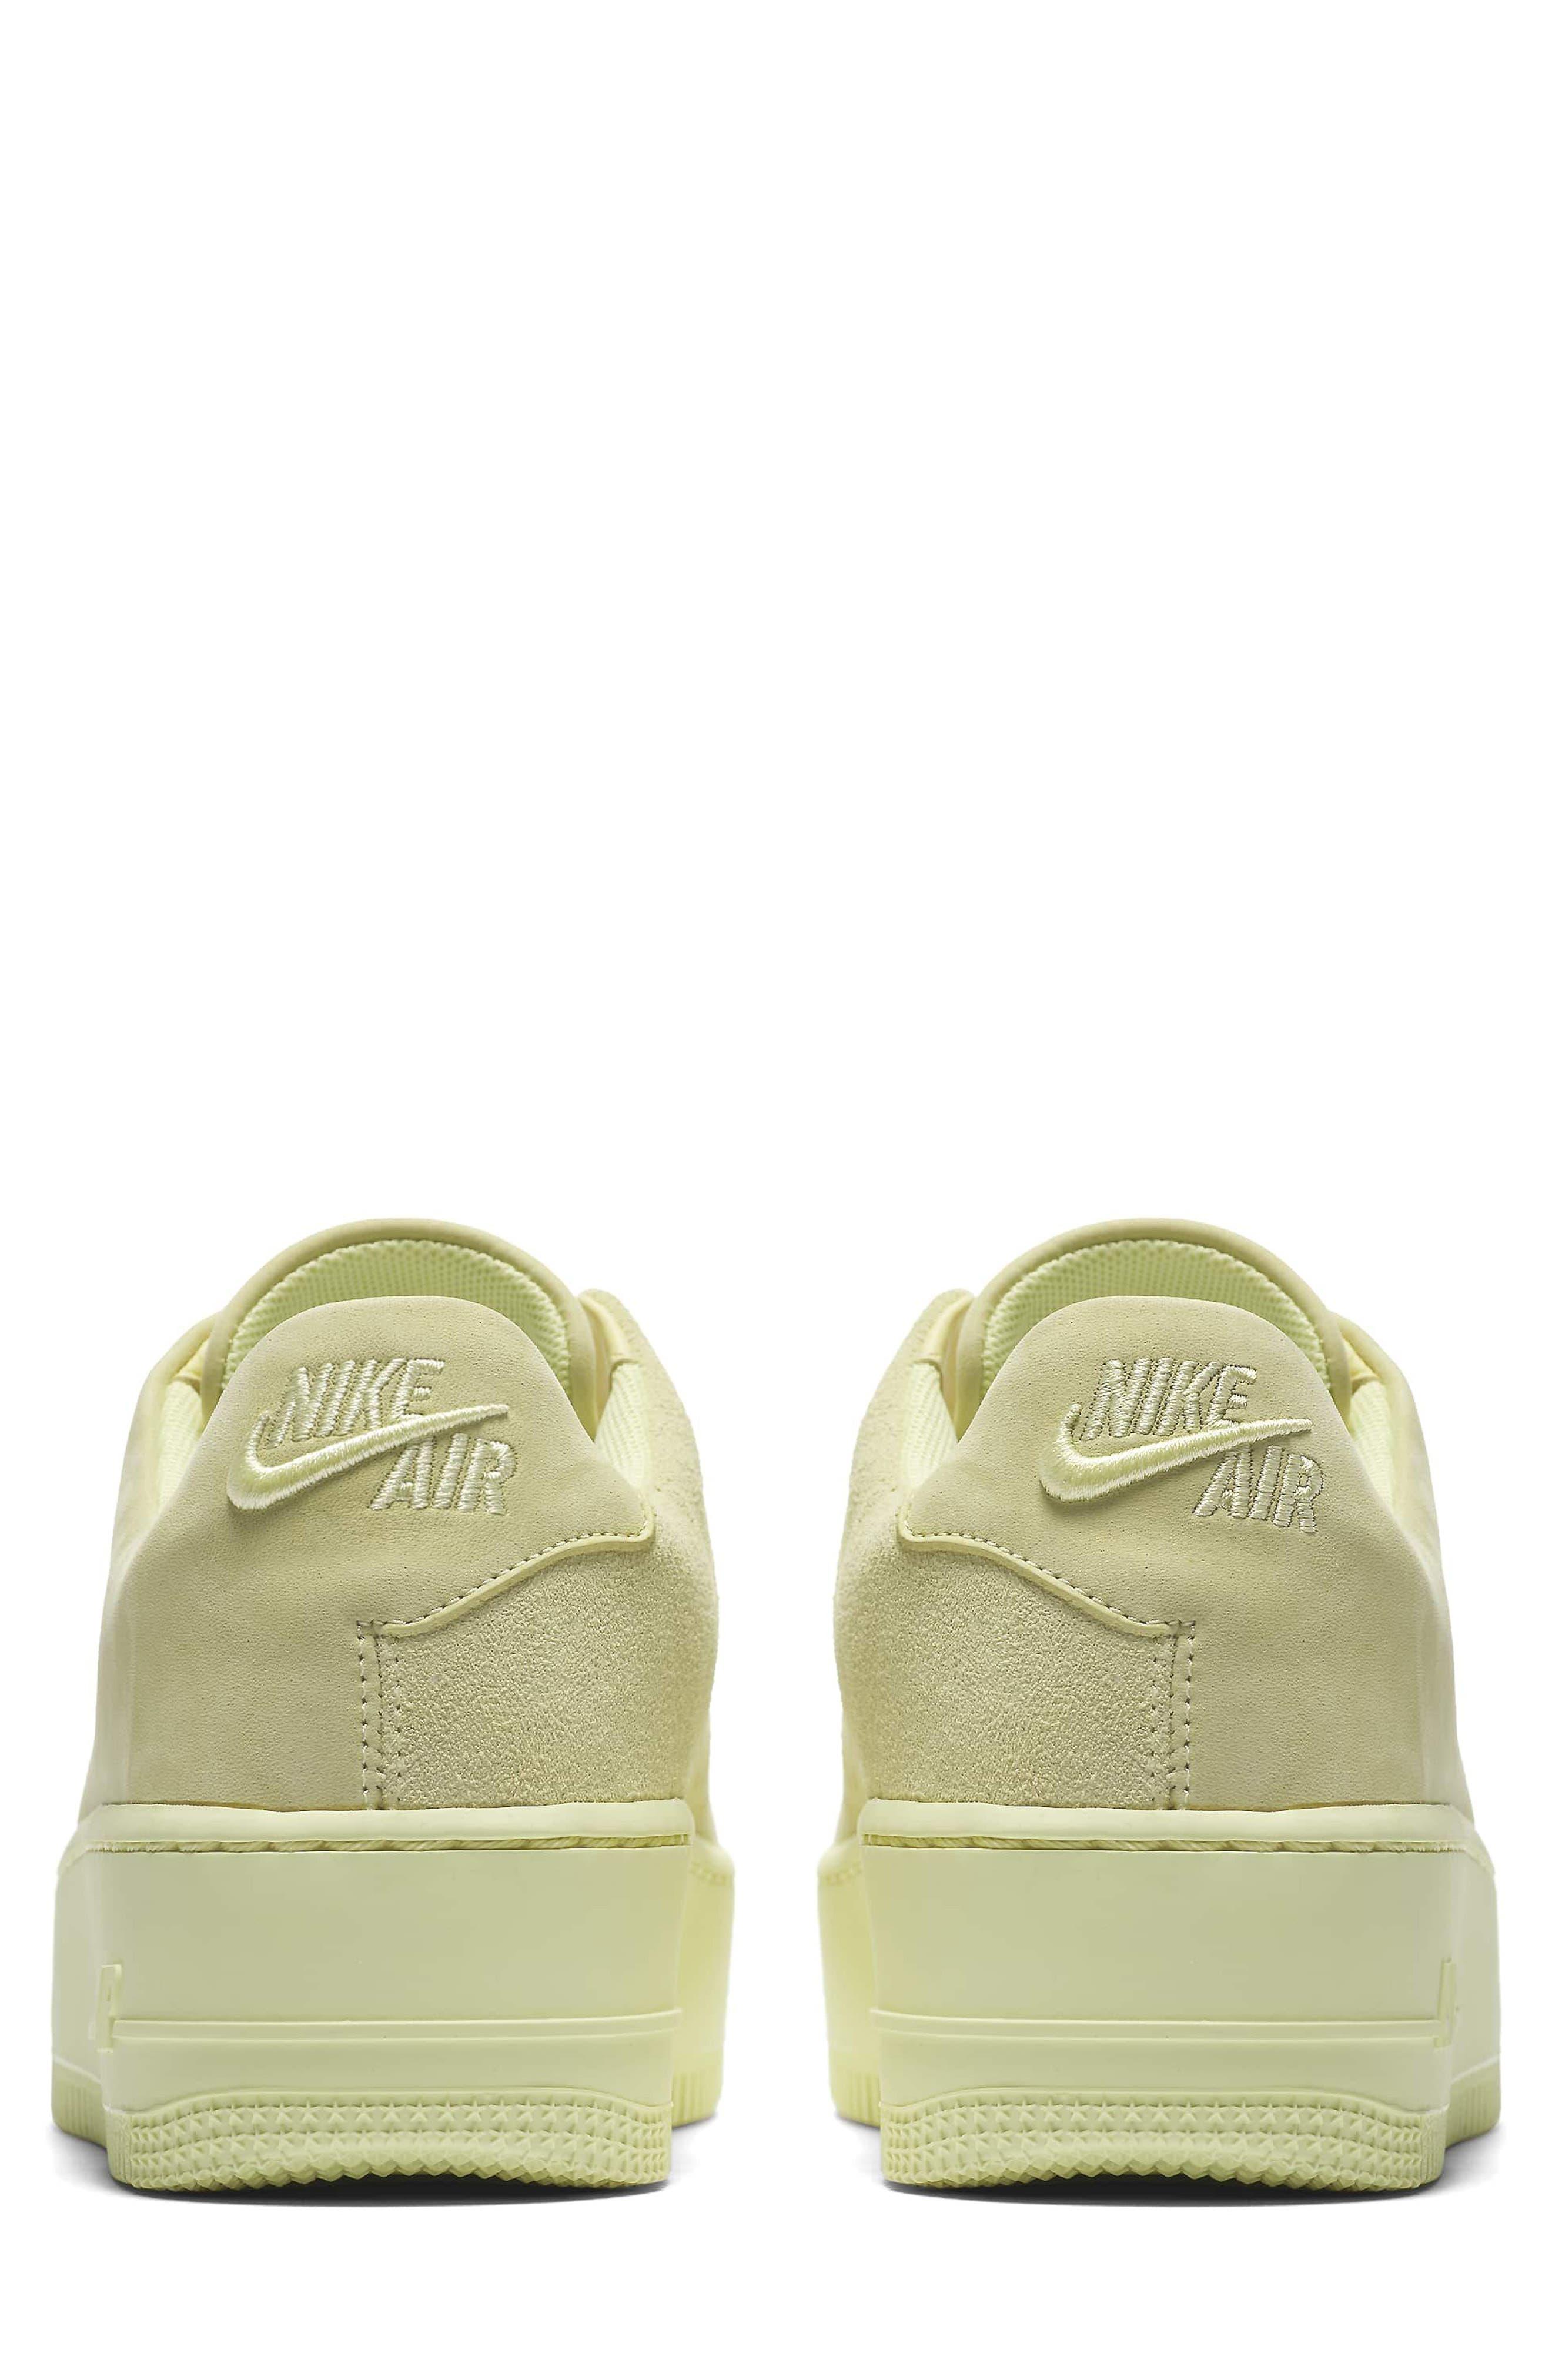 Air Force 1 Sage XX Sneaker,                             Alternate thumbnail 2, color,                             Luminous Green